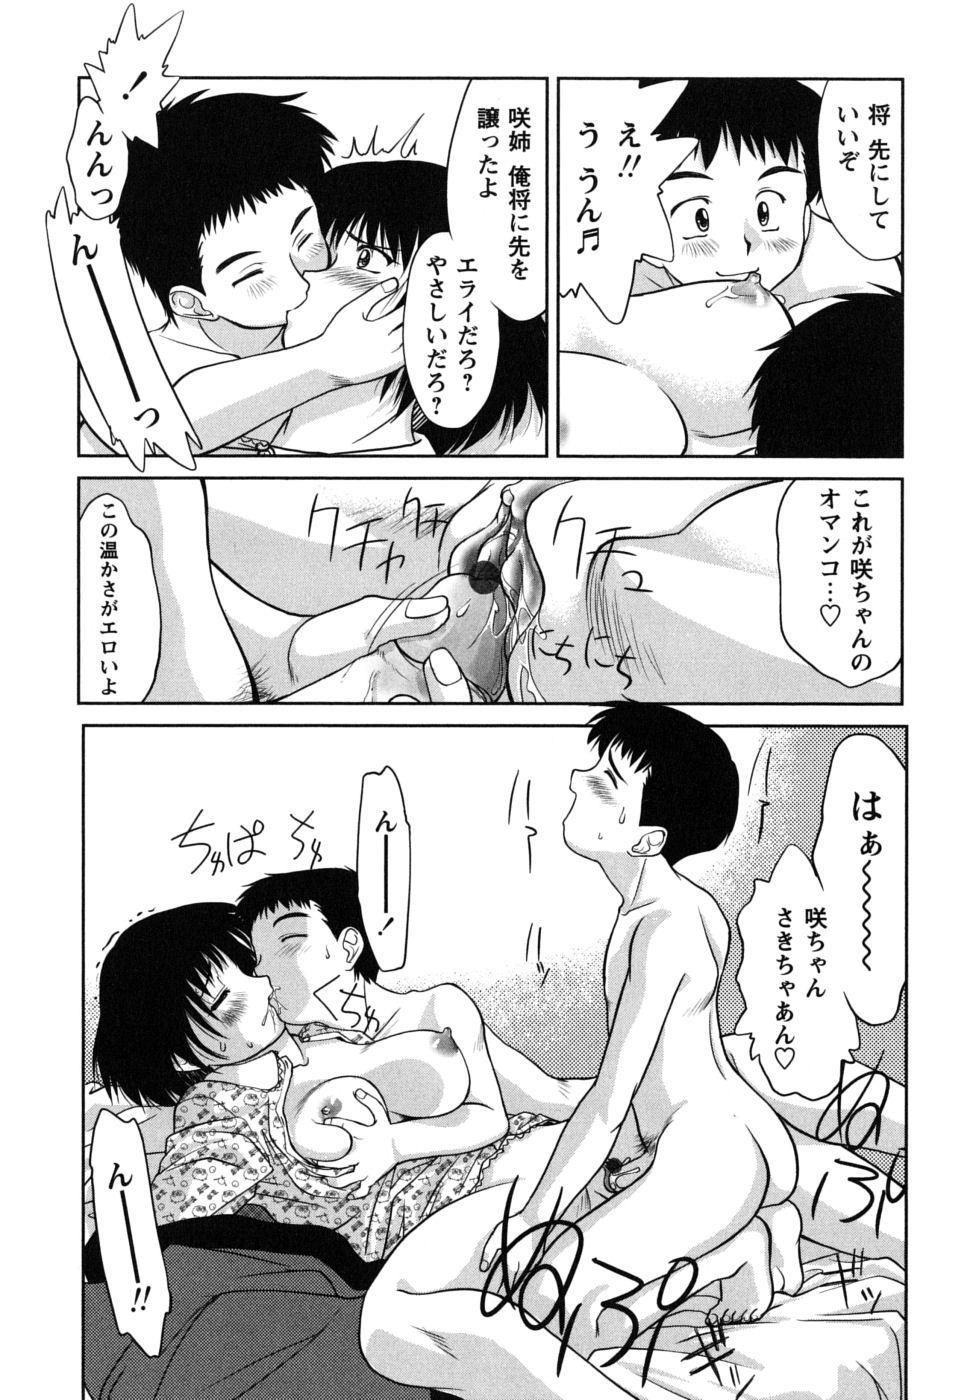 Futa Go Ecchi 74